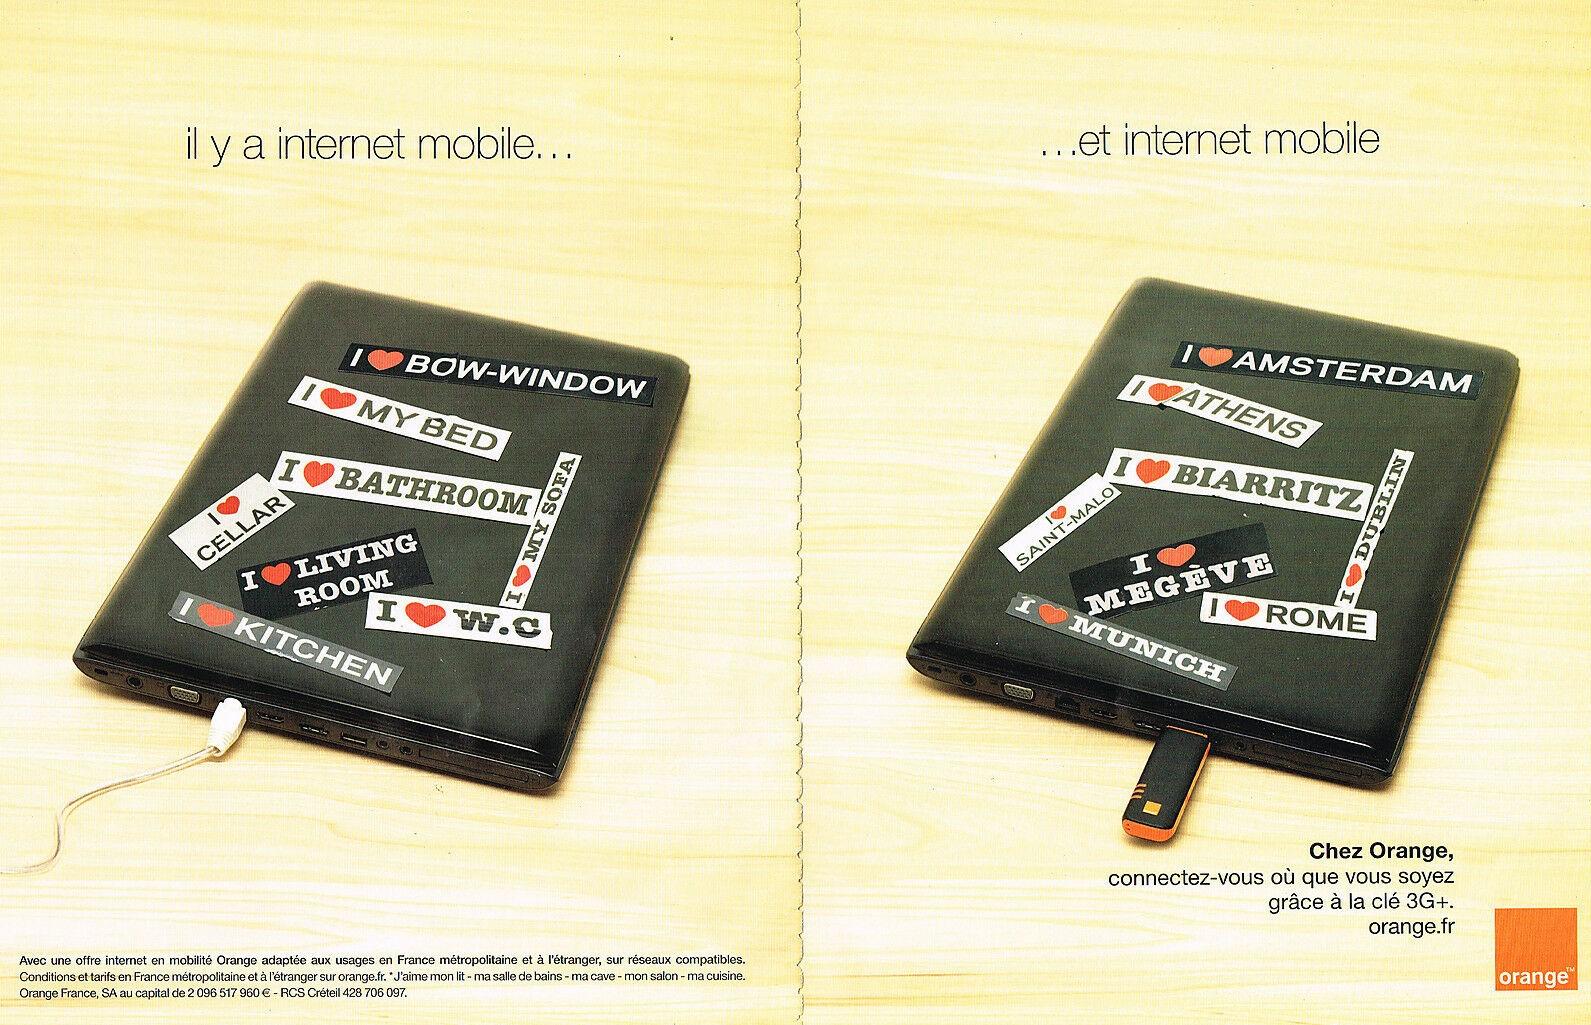 2009 ORANGE internet mobile